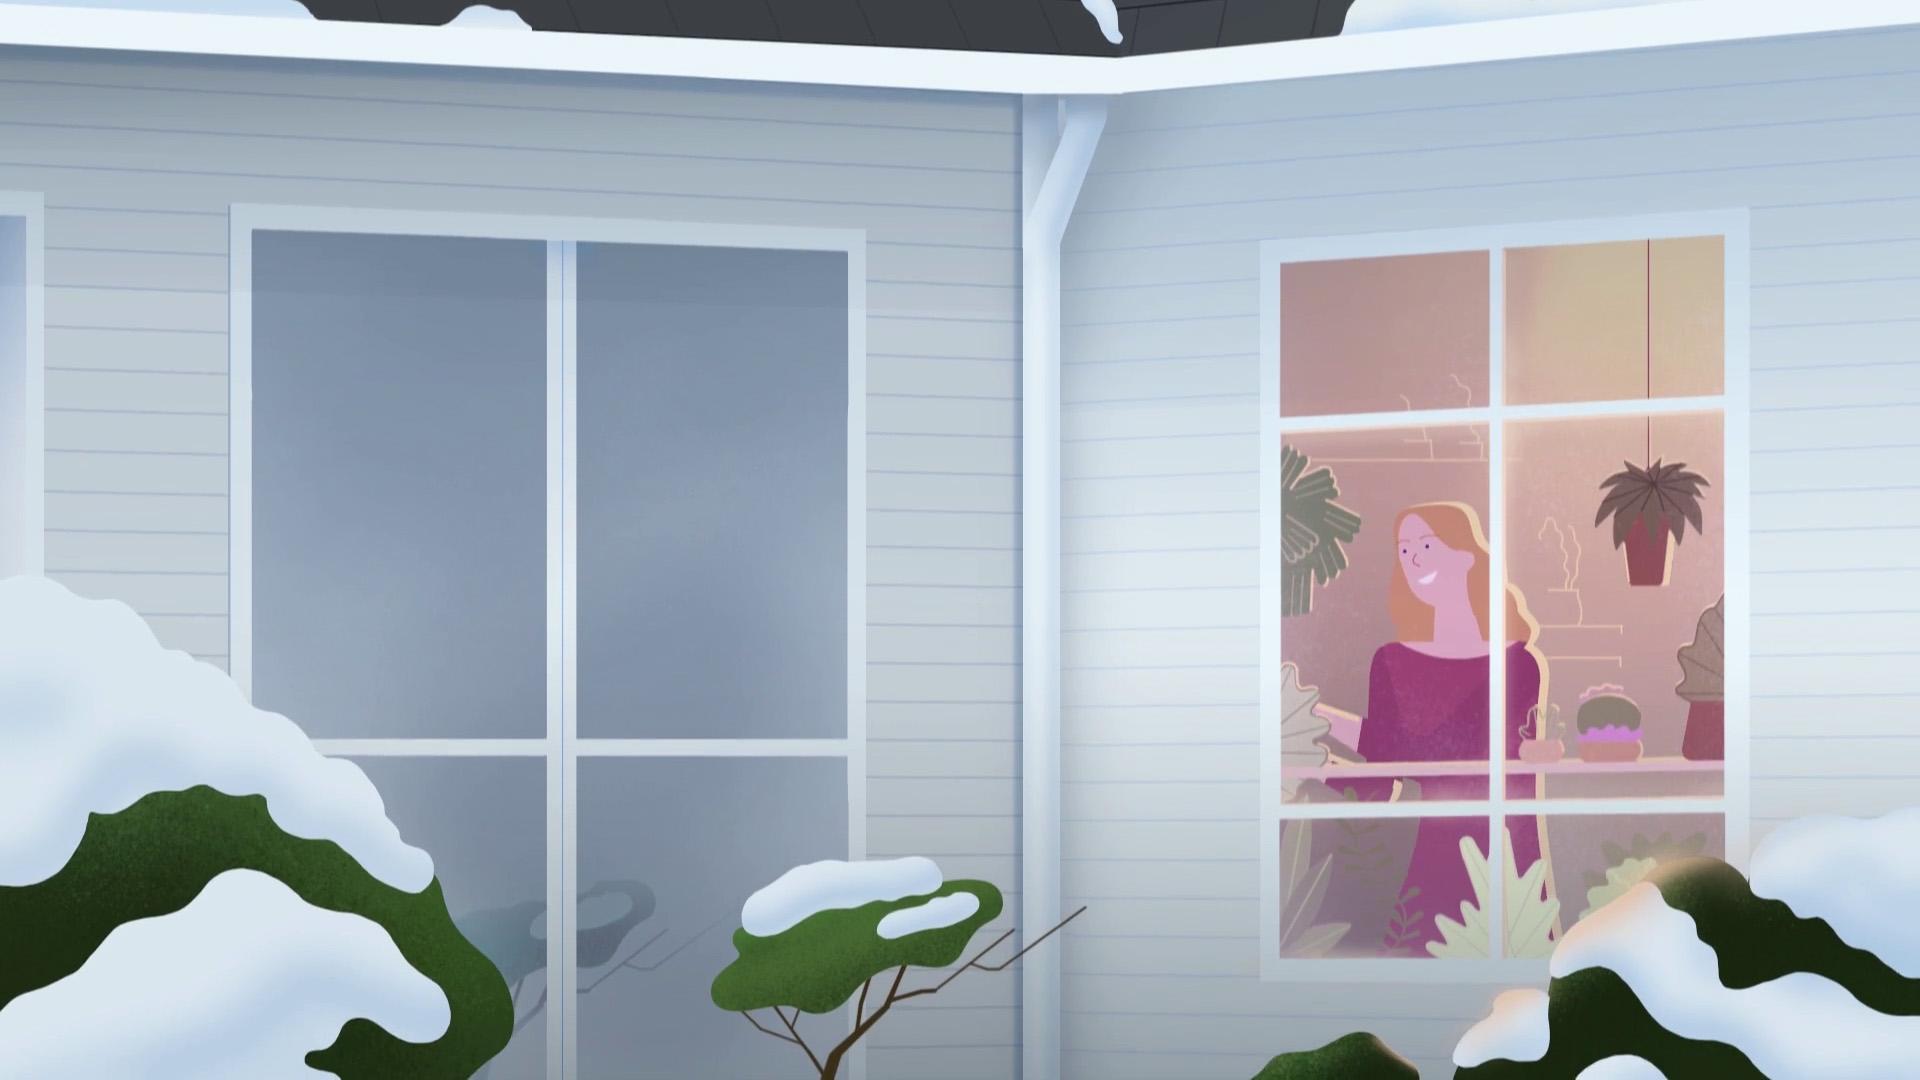 roofstudio_monier-solar-roofing_styleframe-02